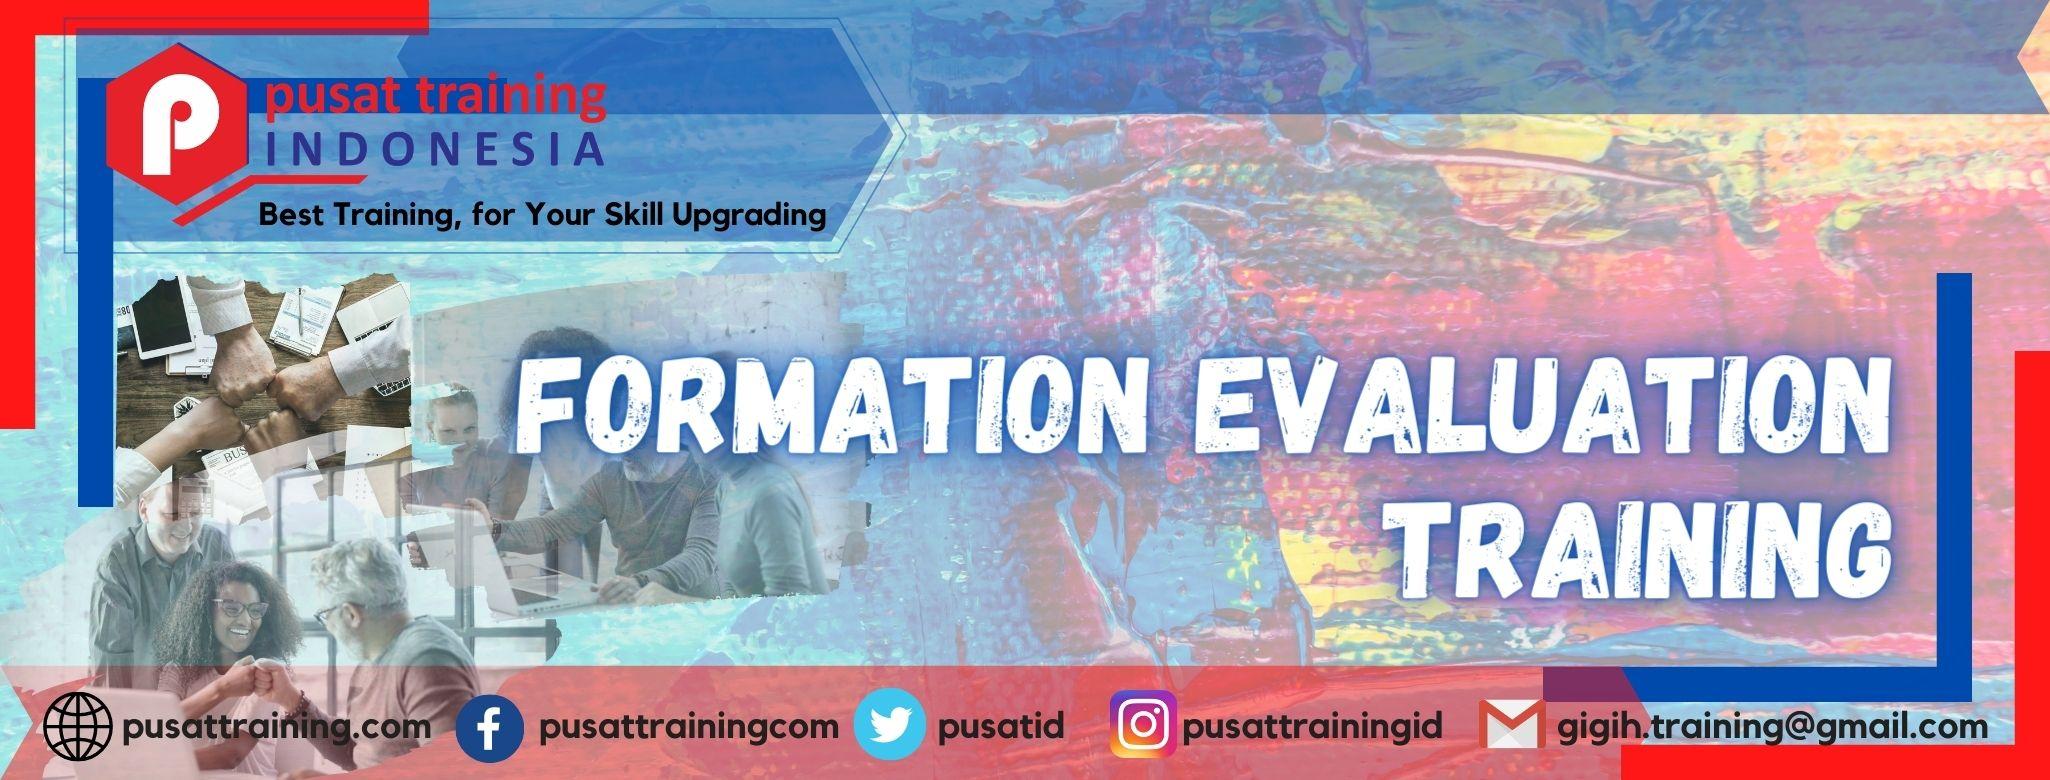 formation-evaluation-training